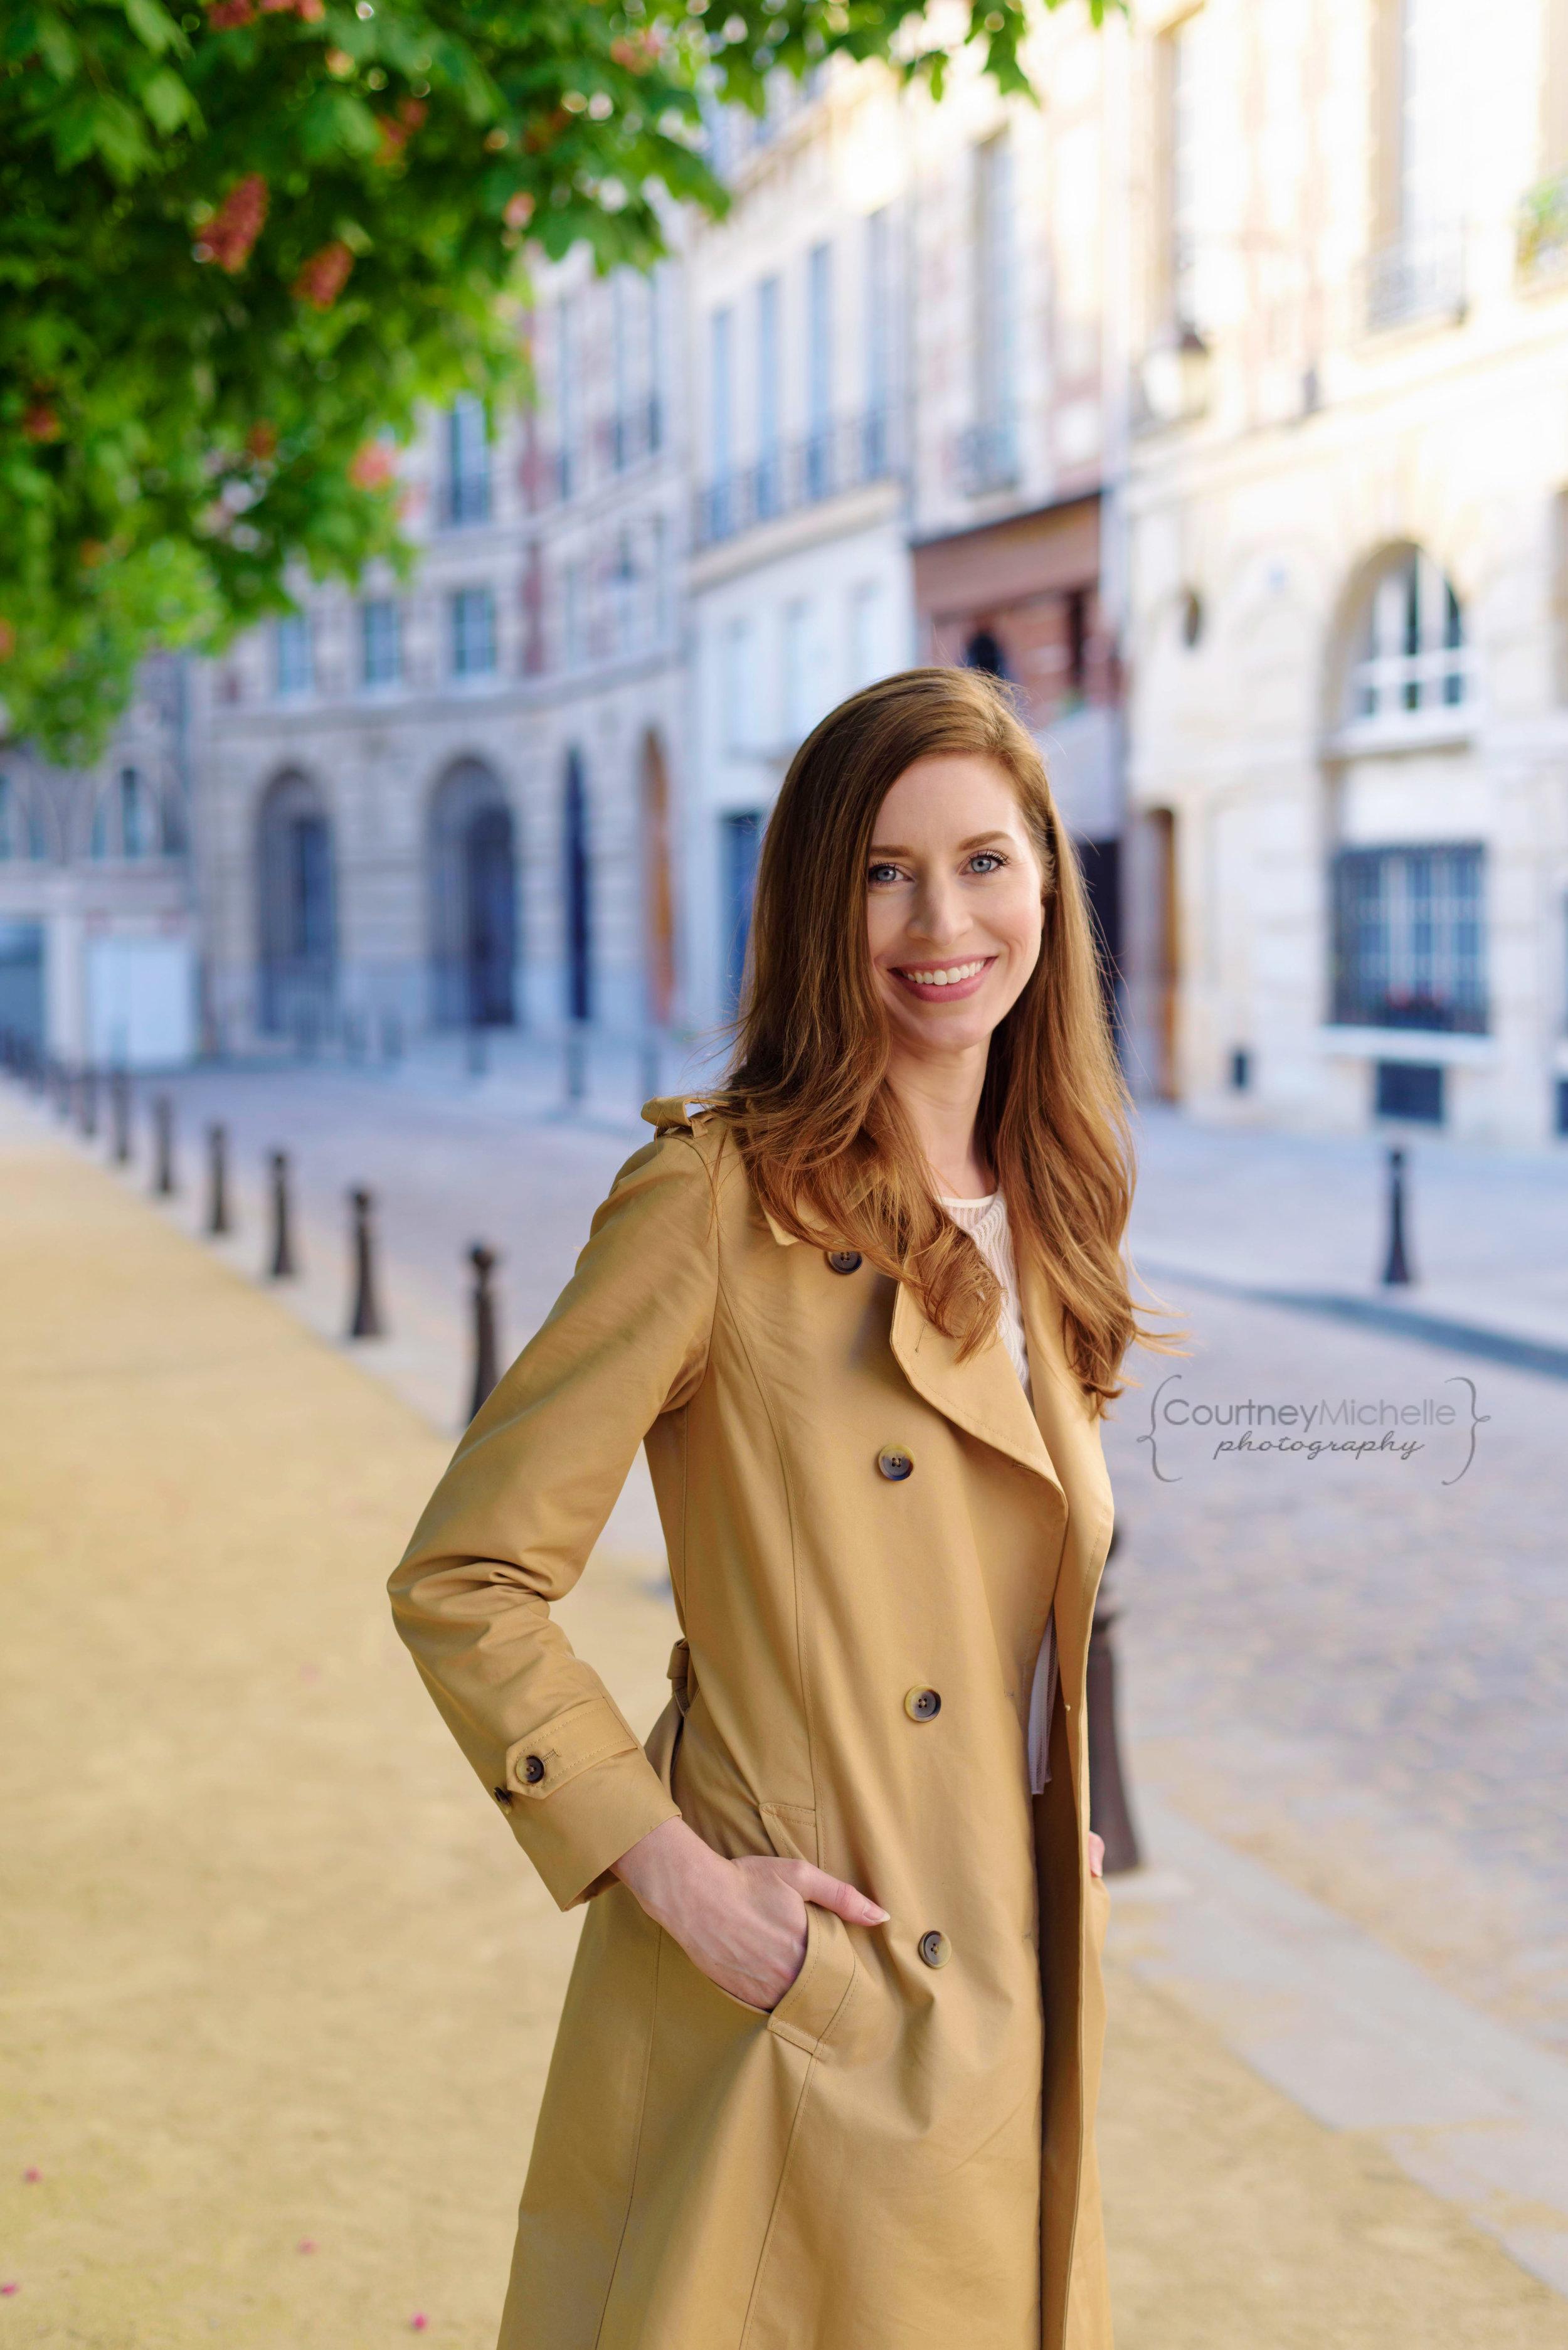 ©CopyrightCMP-paris-photographer_DSC6698.jpg